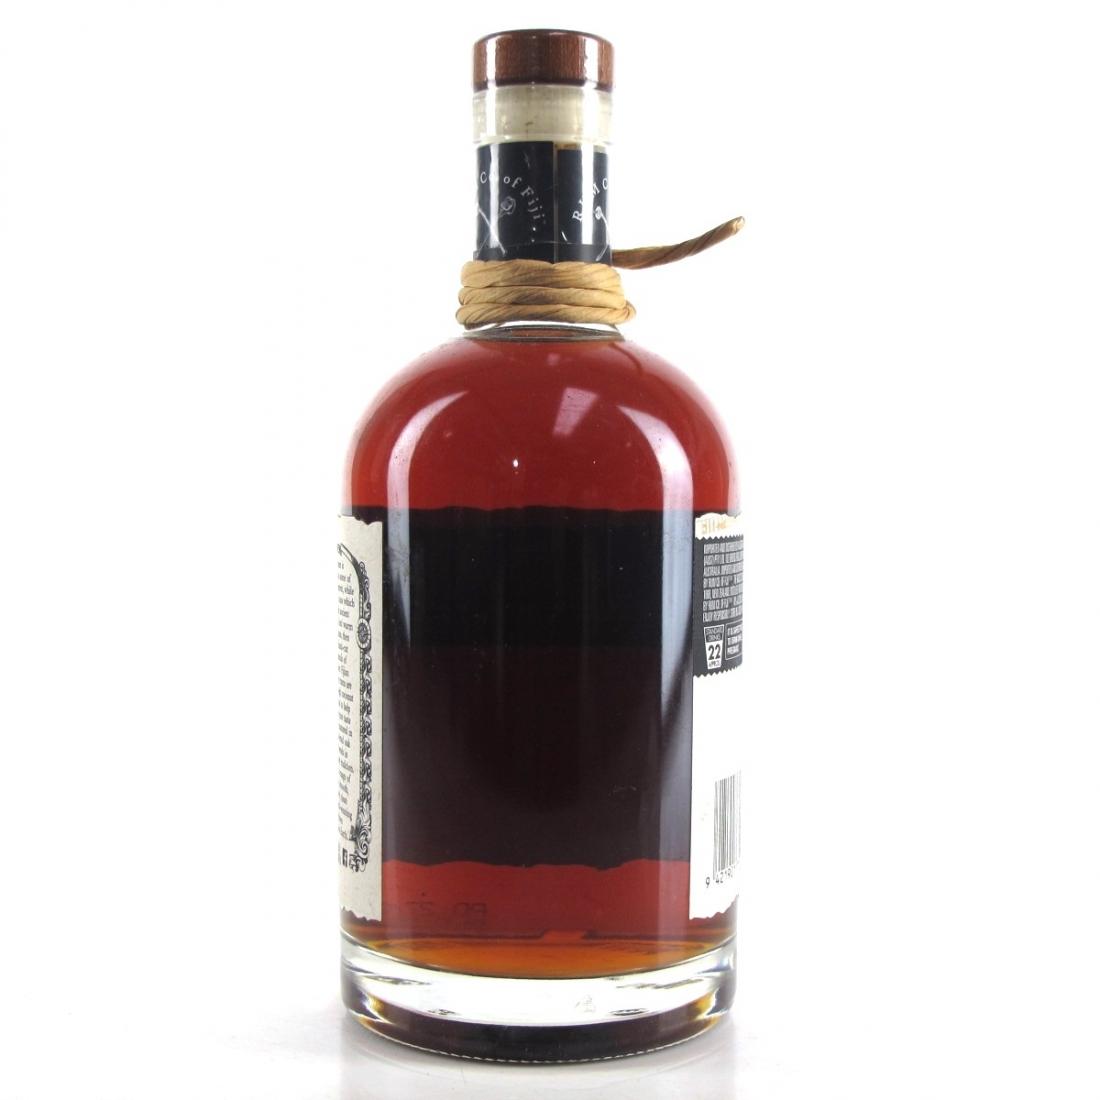 Ratu 5 Year Old Fiji Dark Premium Rum